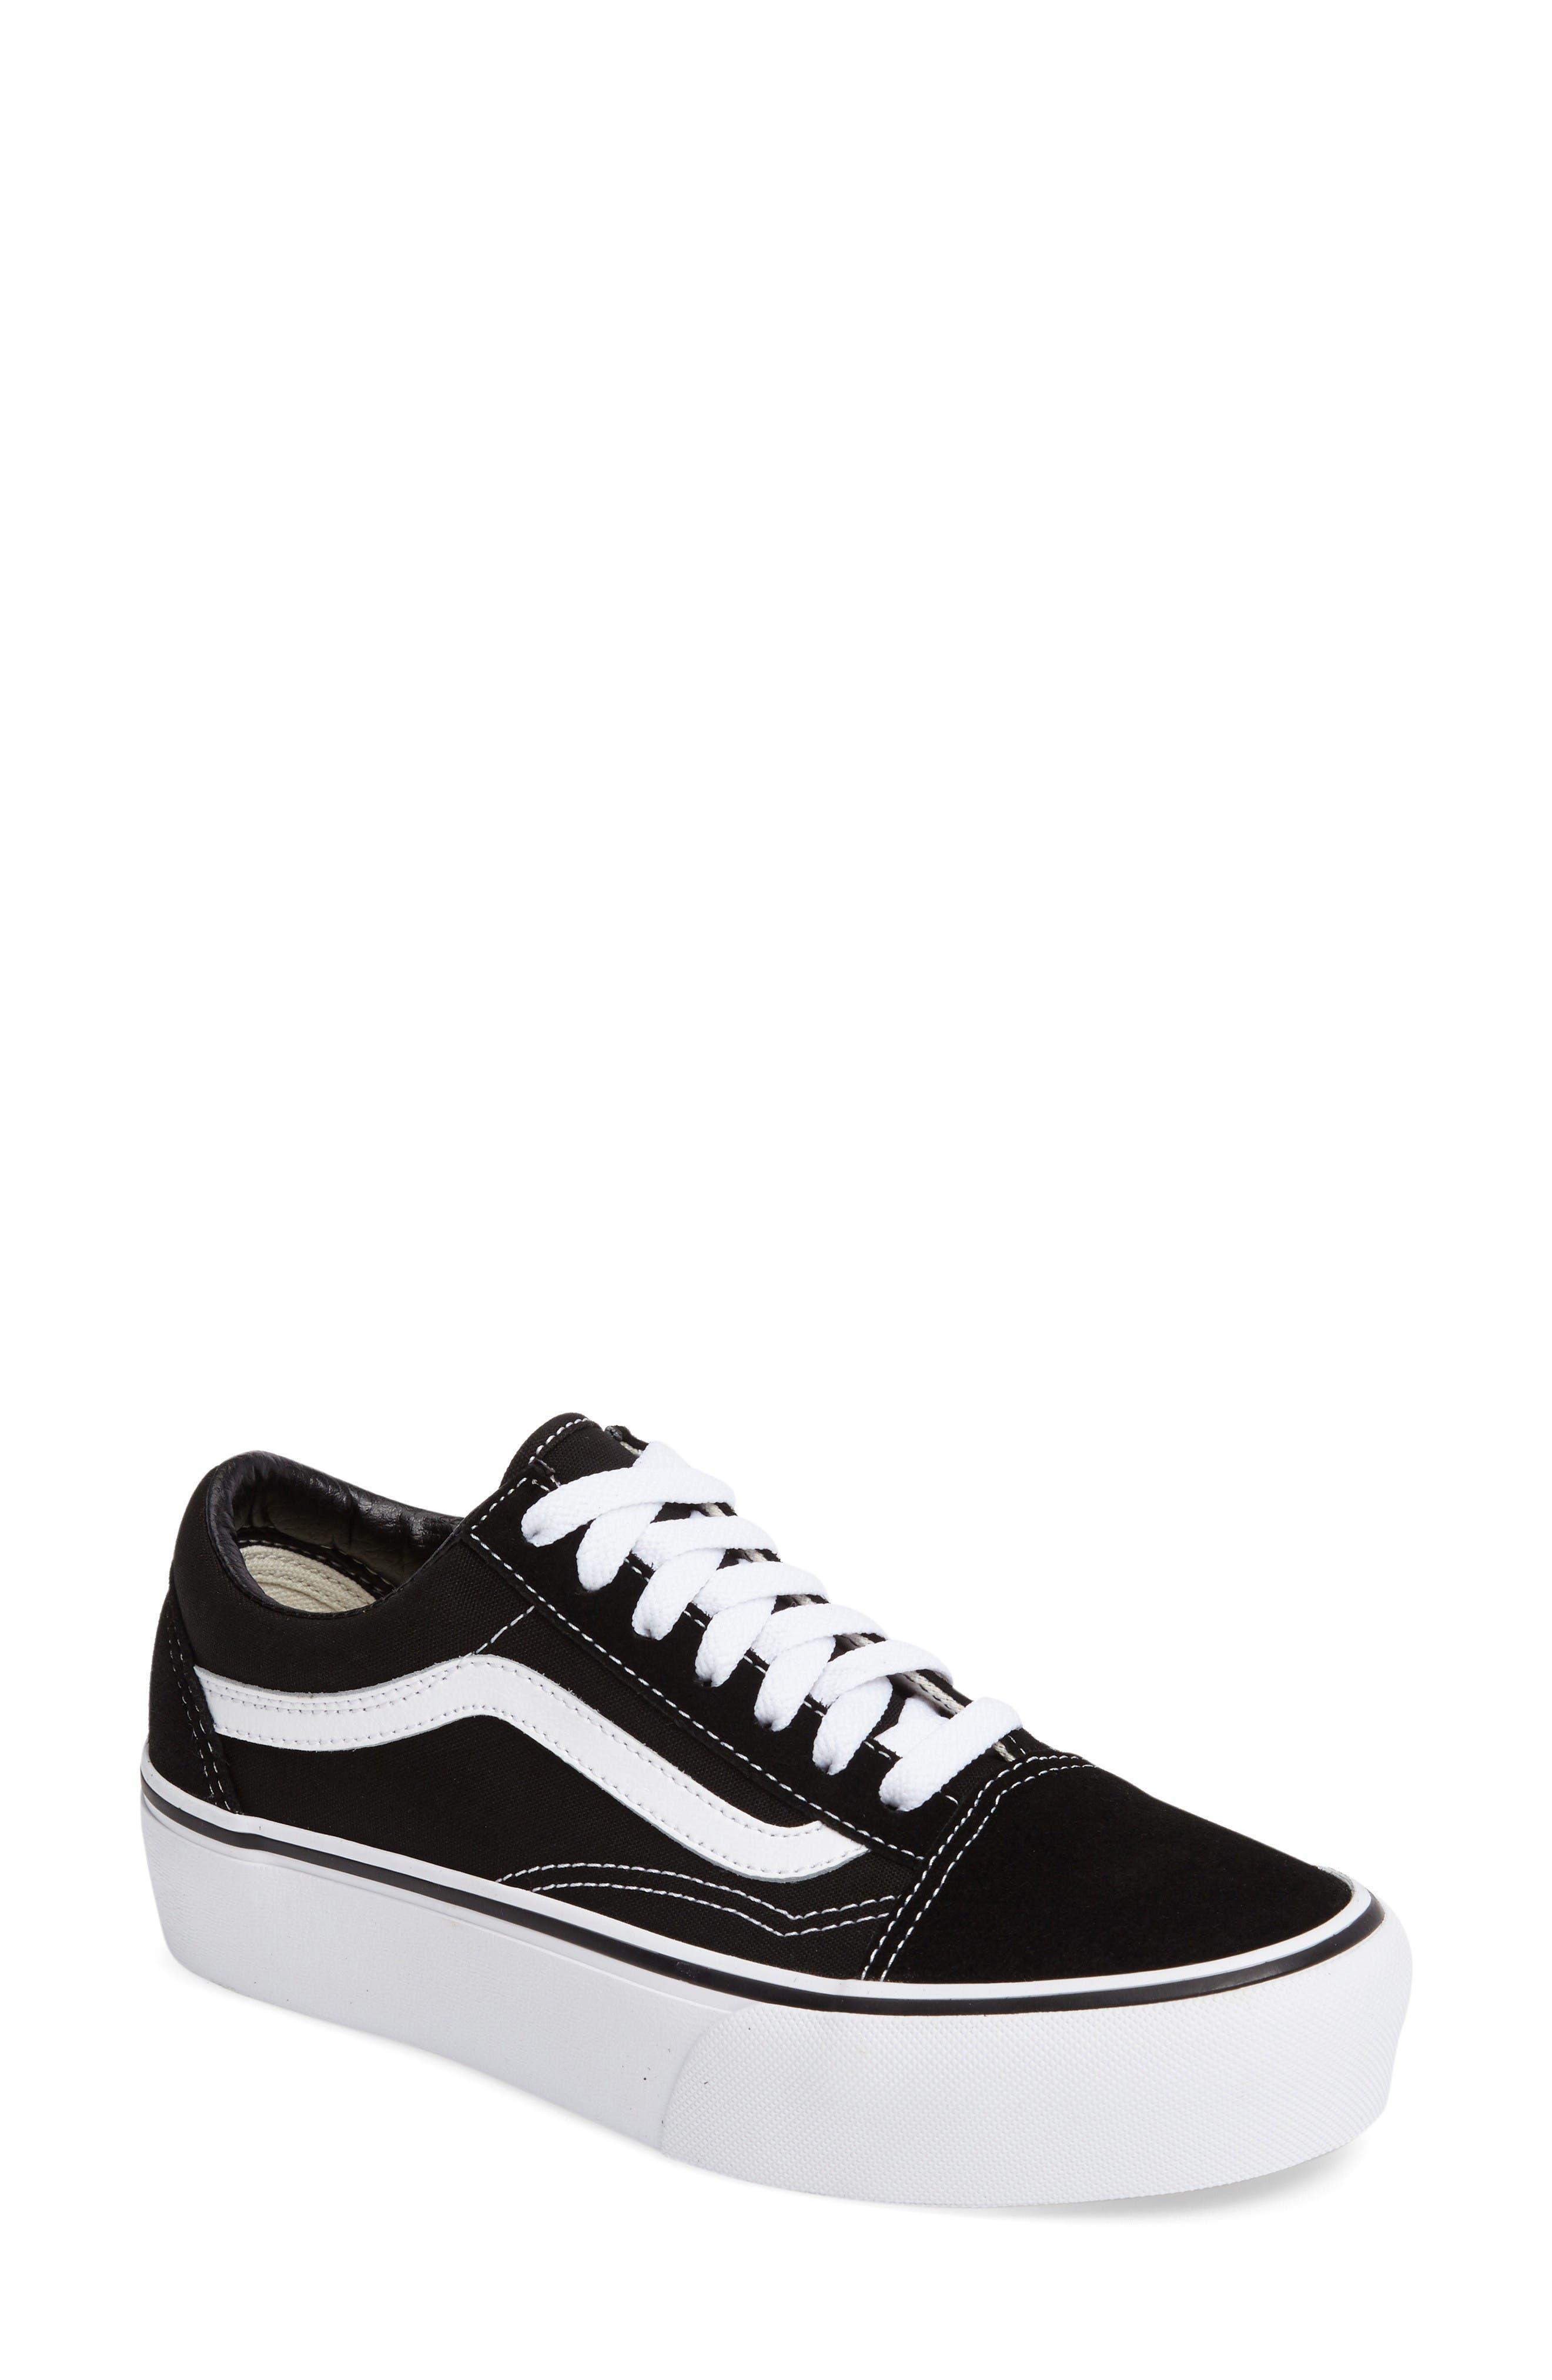 Old Skool Platform Sneaker,                         Main,                         color, Black/ White